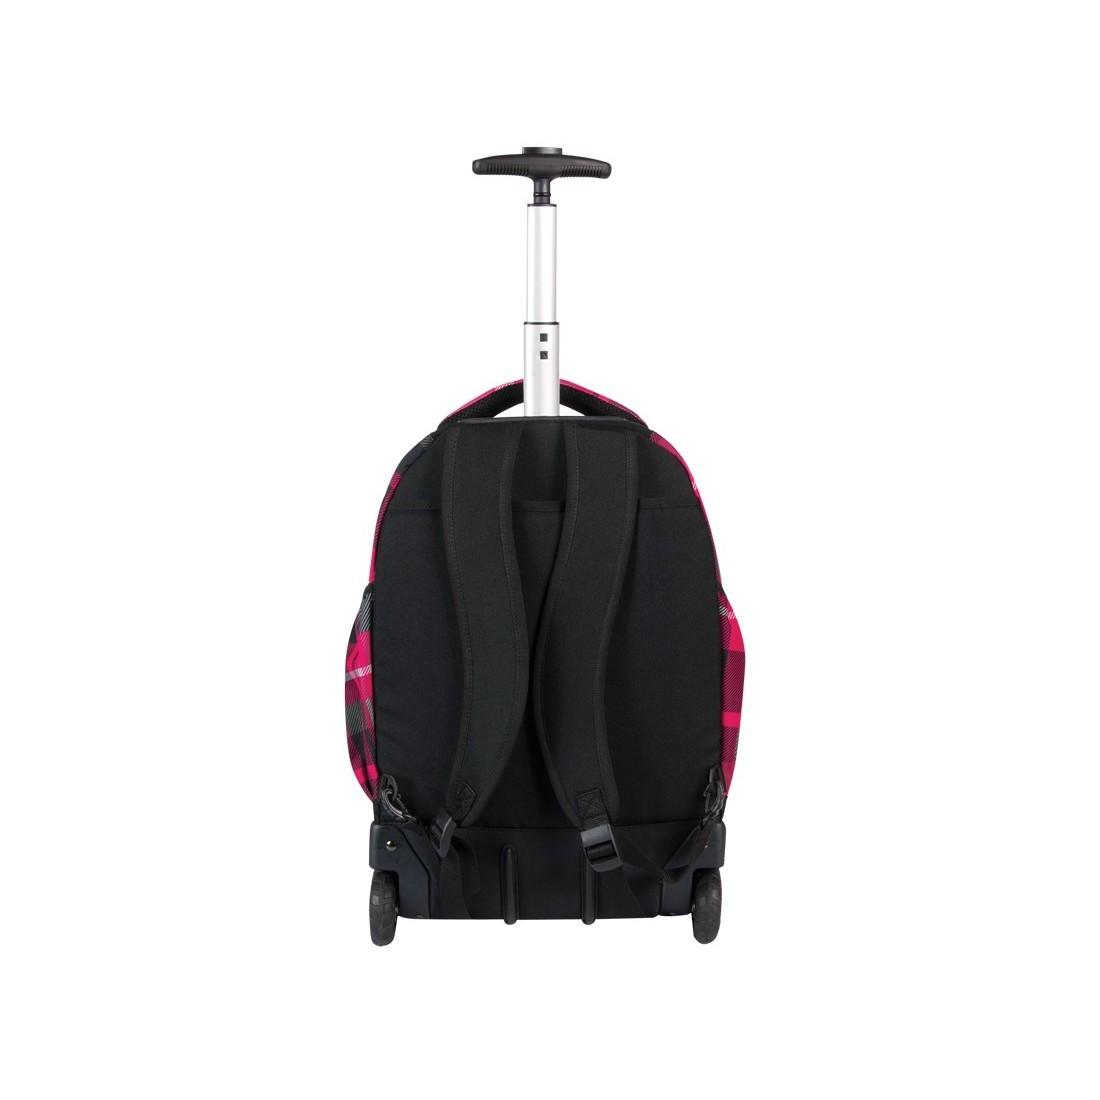 Plecak CoolPack na kółkach dla dziewczynki w kratę - RAPID RUBIN CP 103 - plecak-tornister.pl